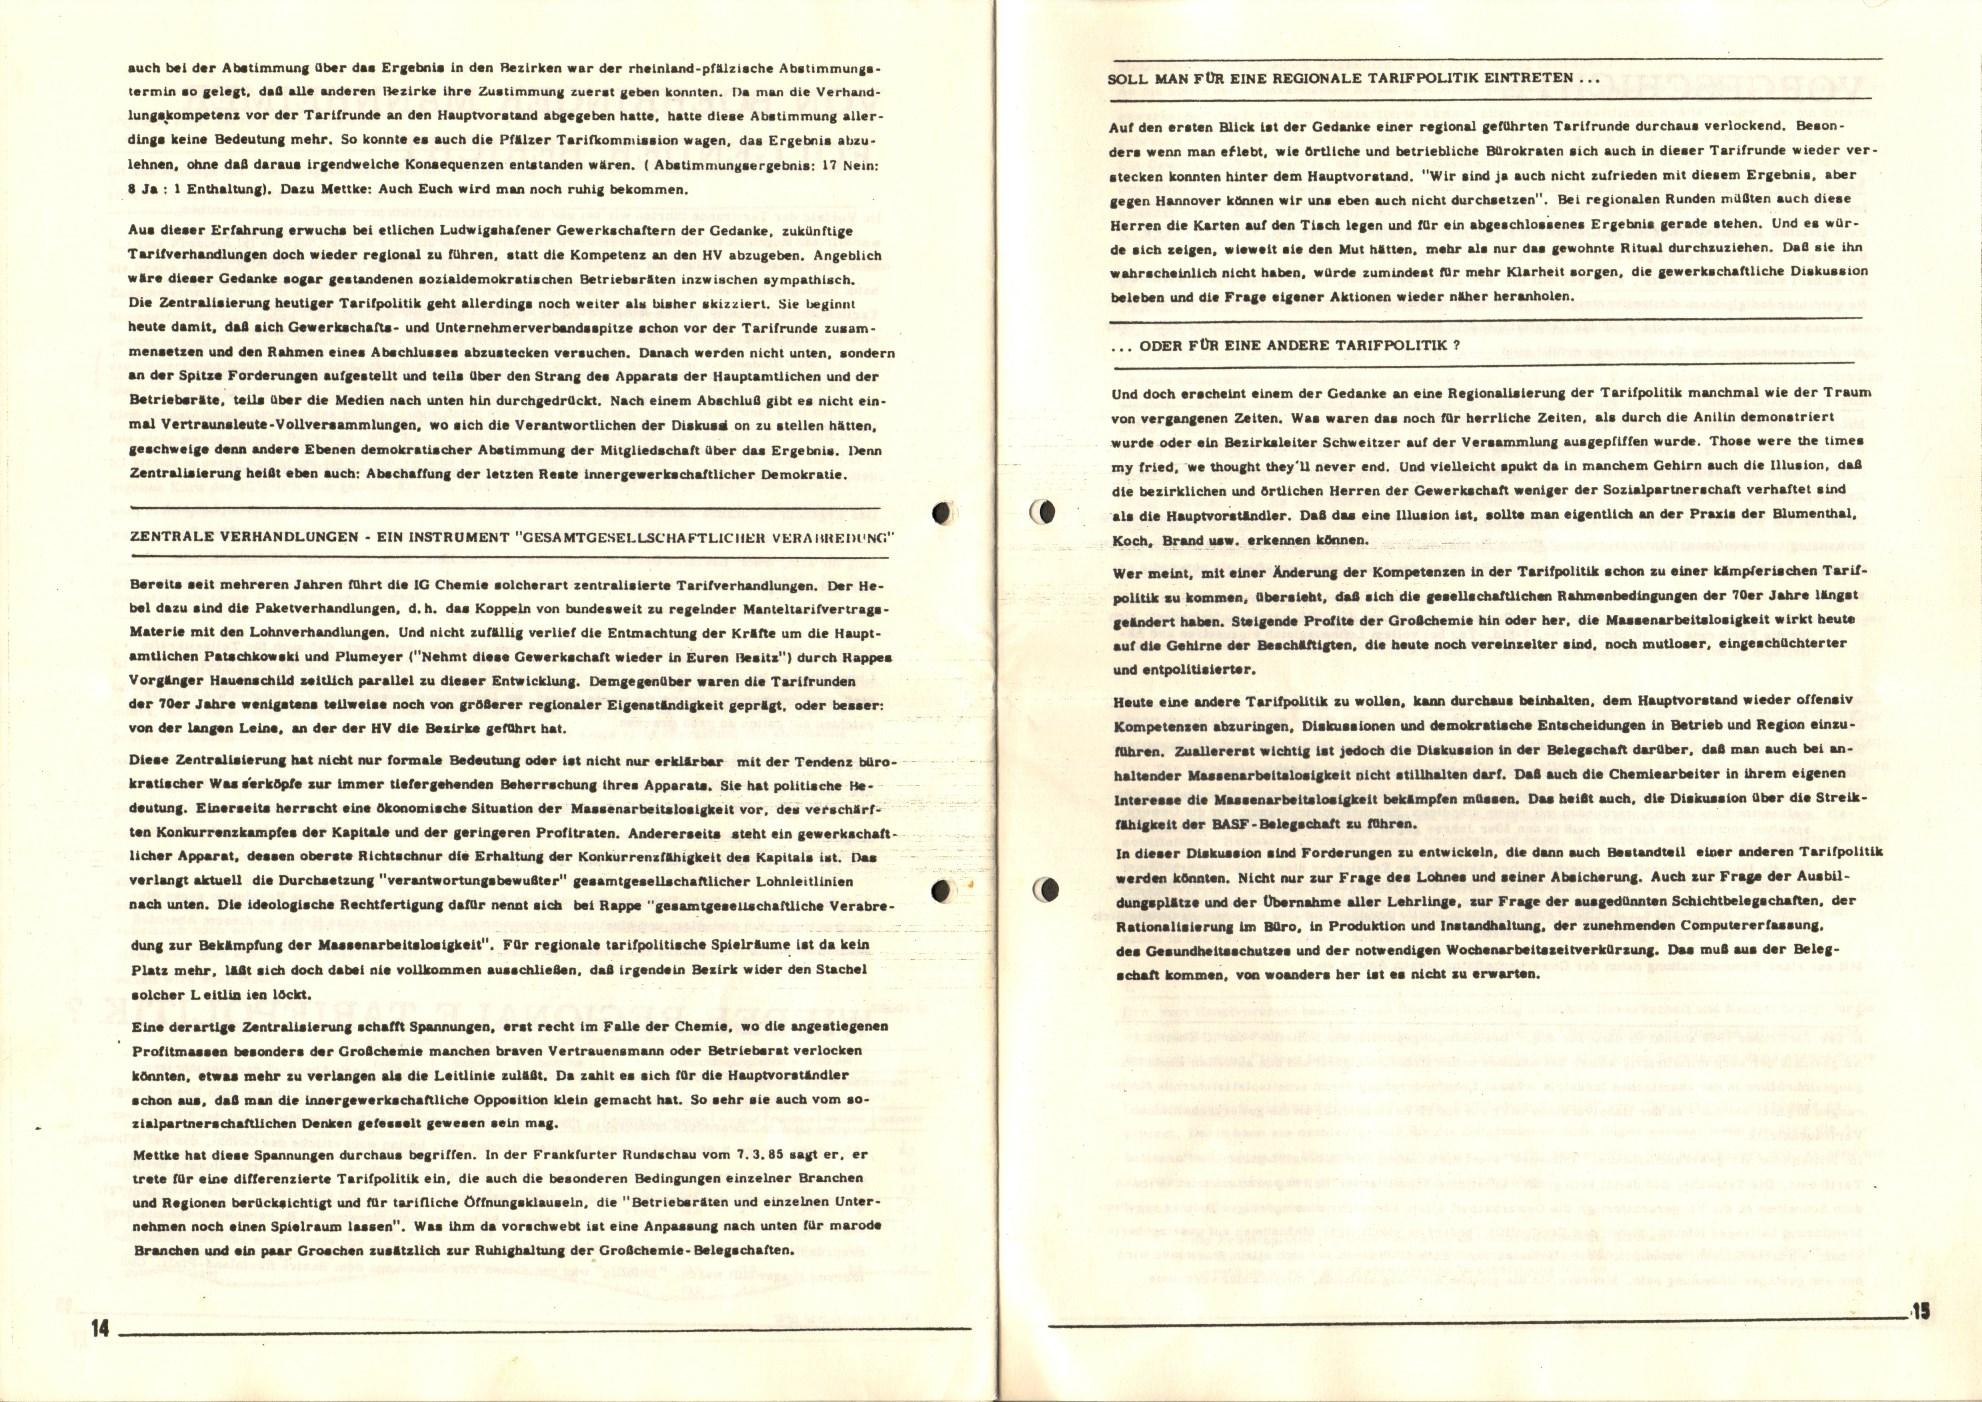 Ludwigshafen_BASF_Chemie_Tarifrunde_1985_08